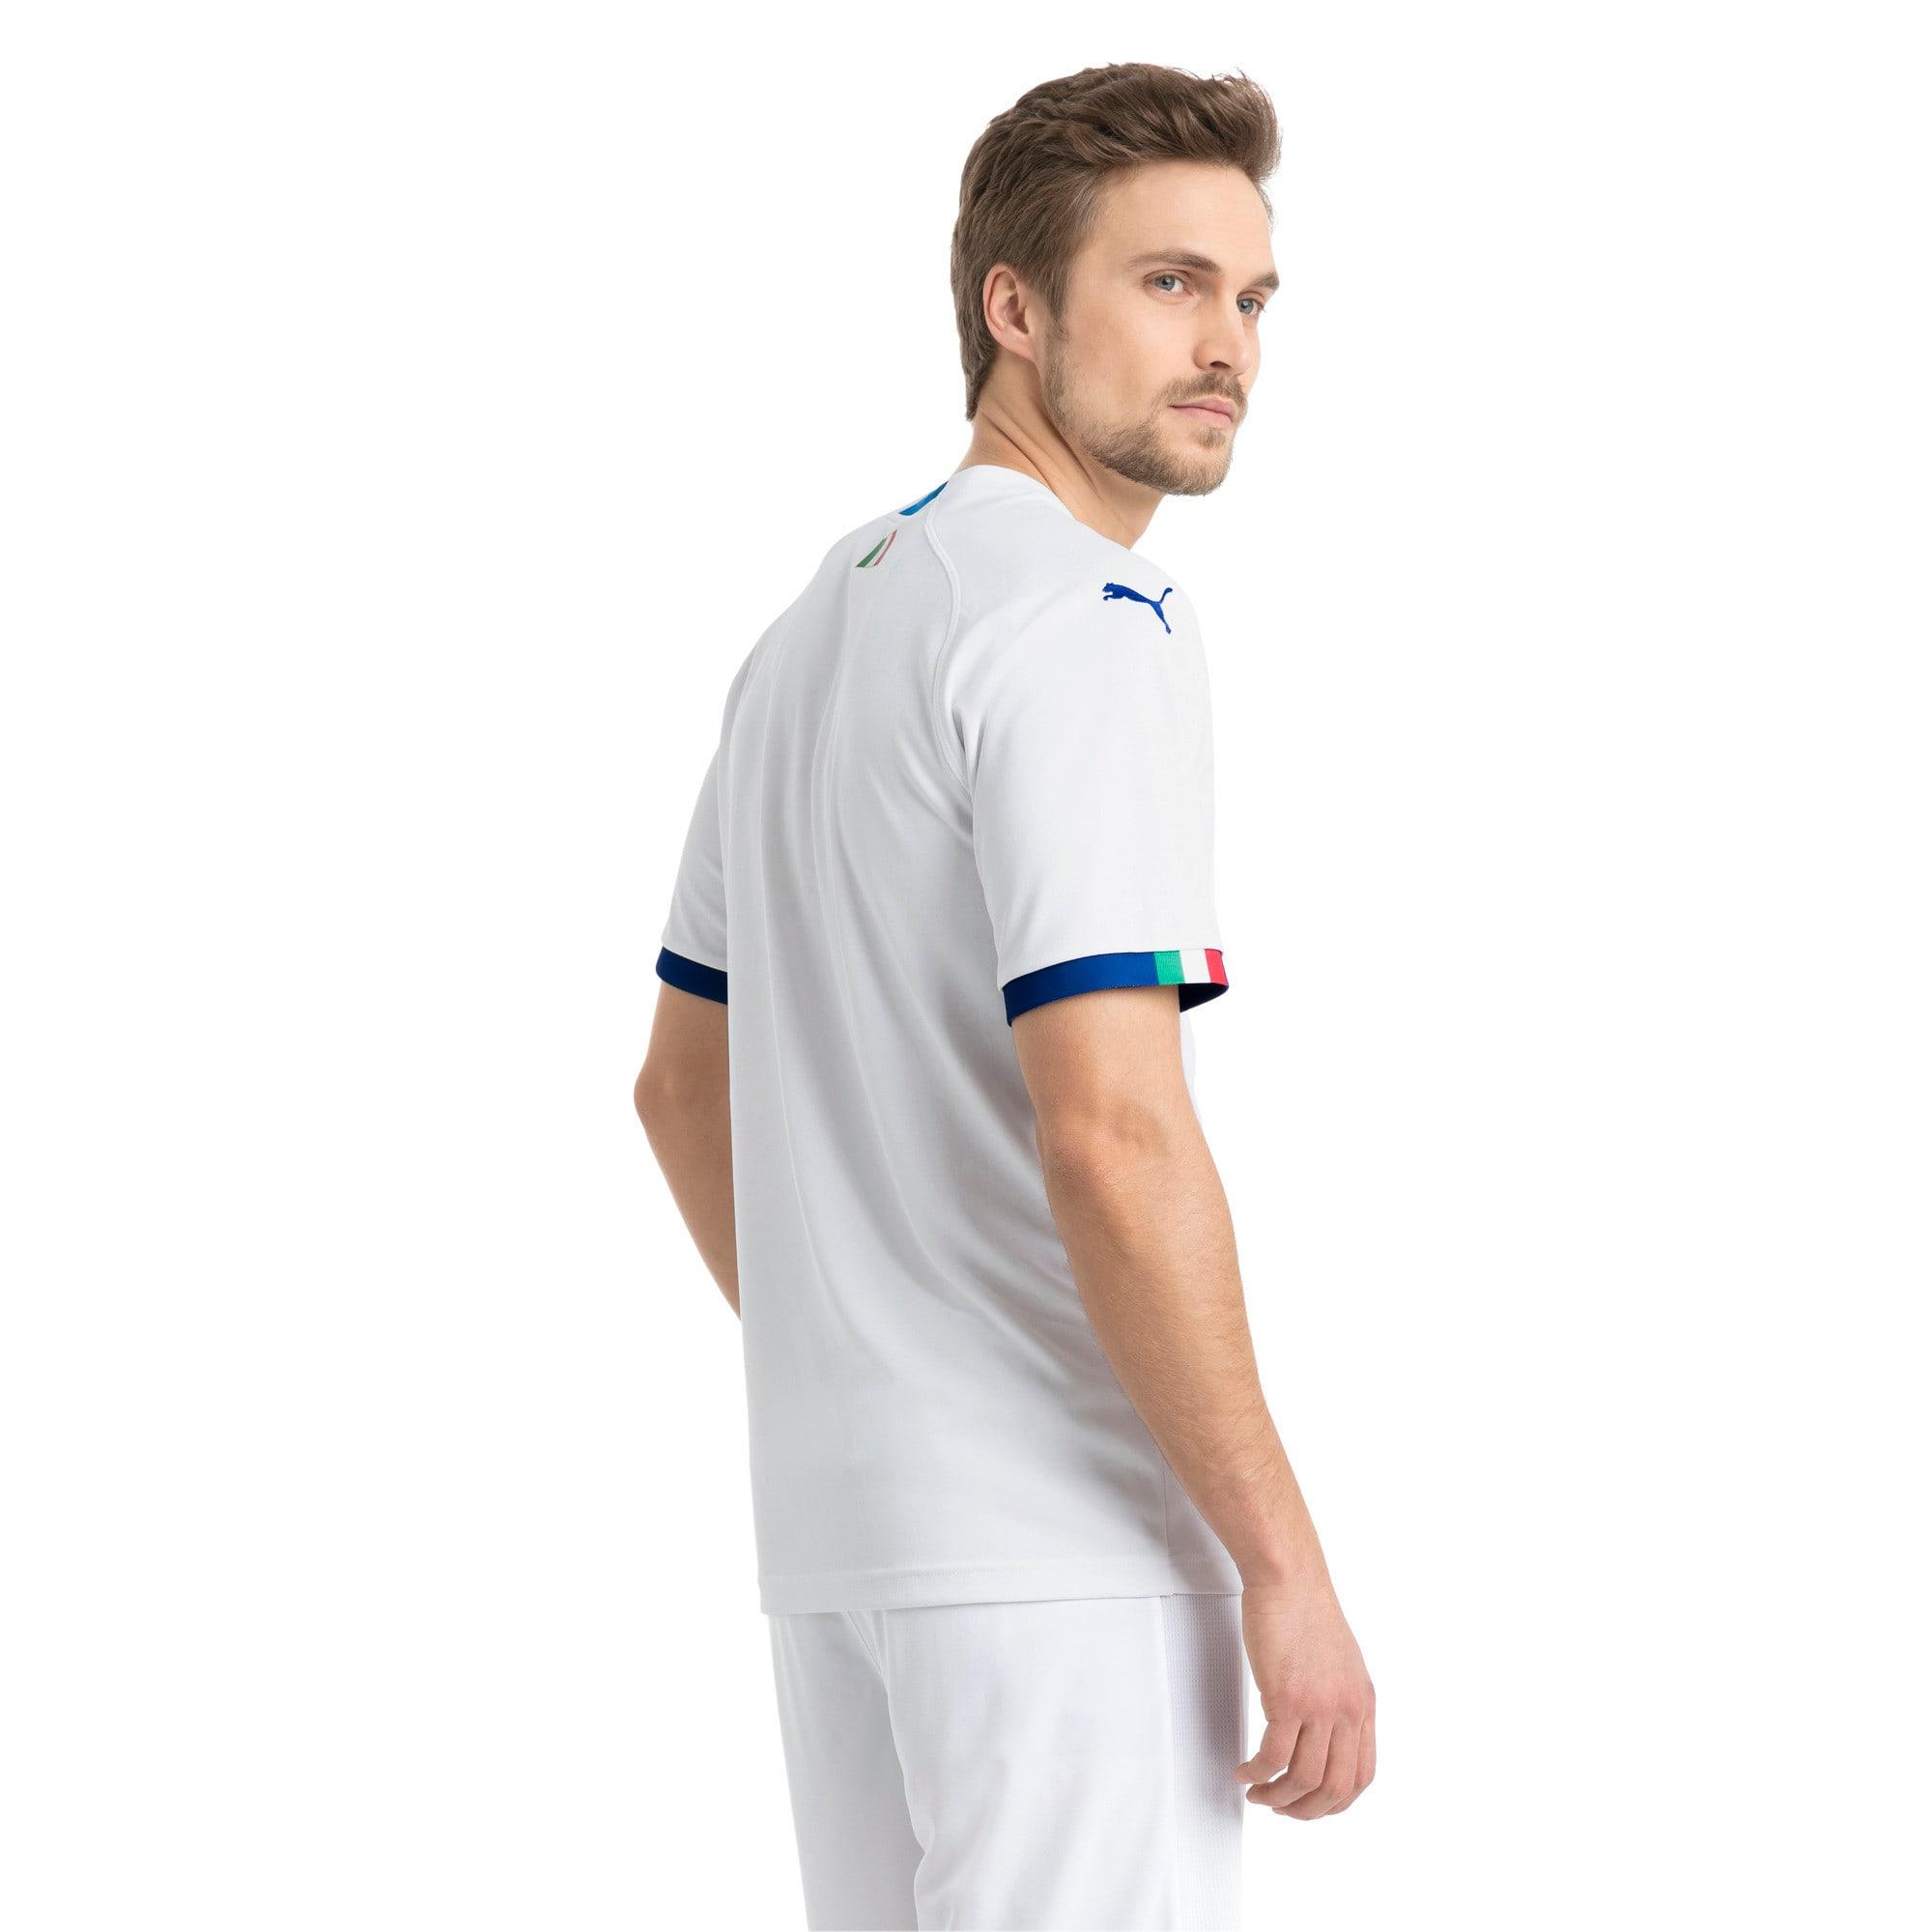 Thumbnail 2 of FIGC ITALIA アウェイ レプリカ SSシャツ 半袖, Puma White-Team Power Blue, medium-JPN